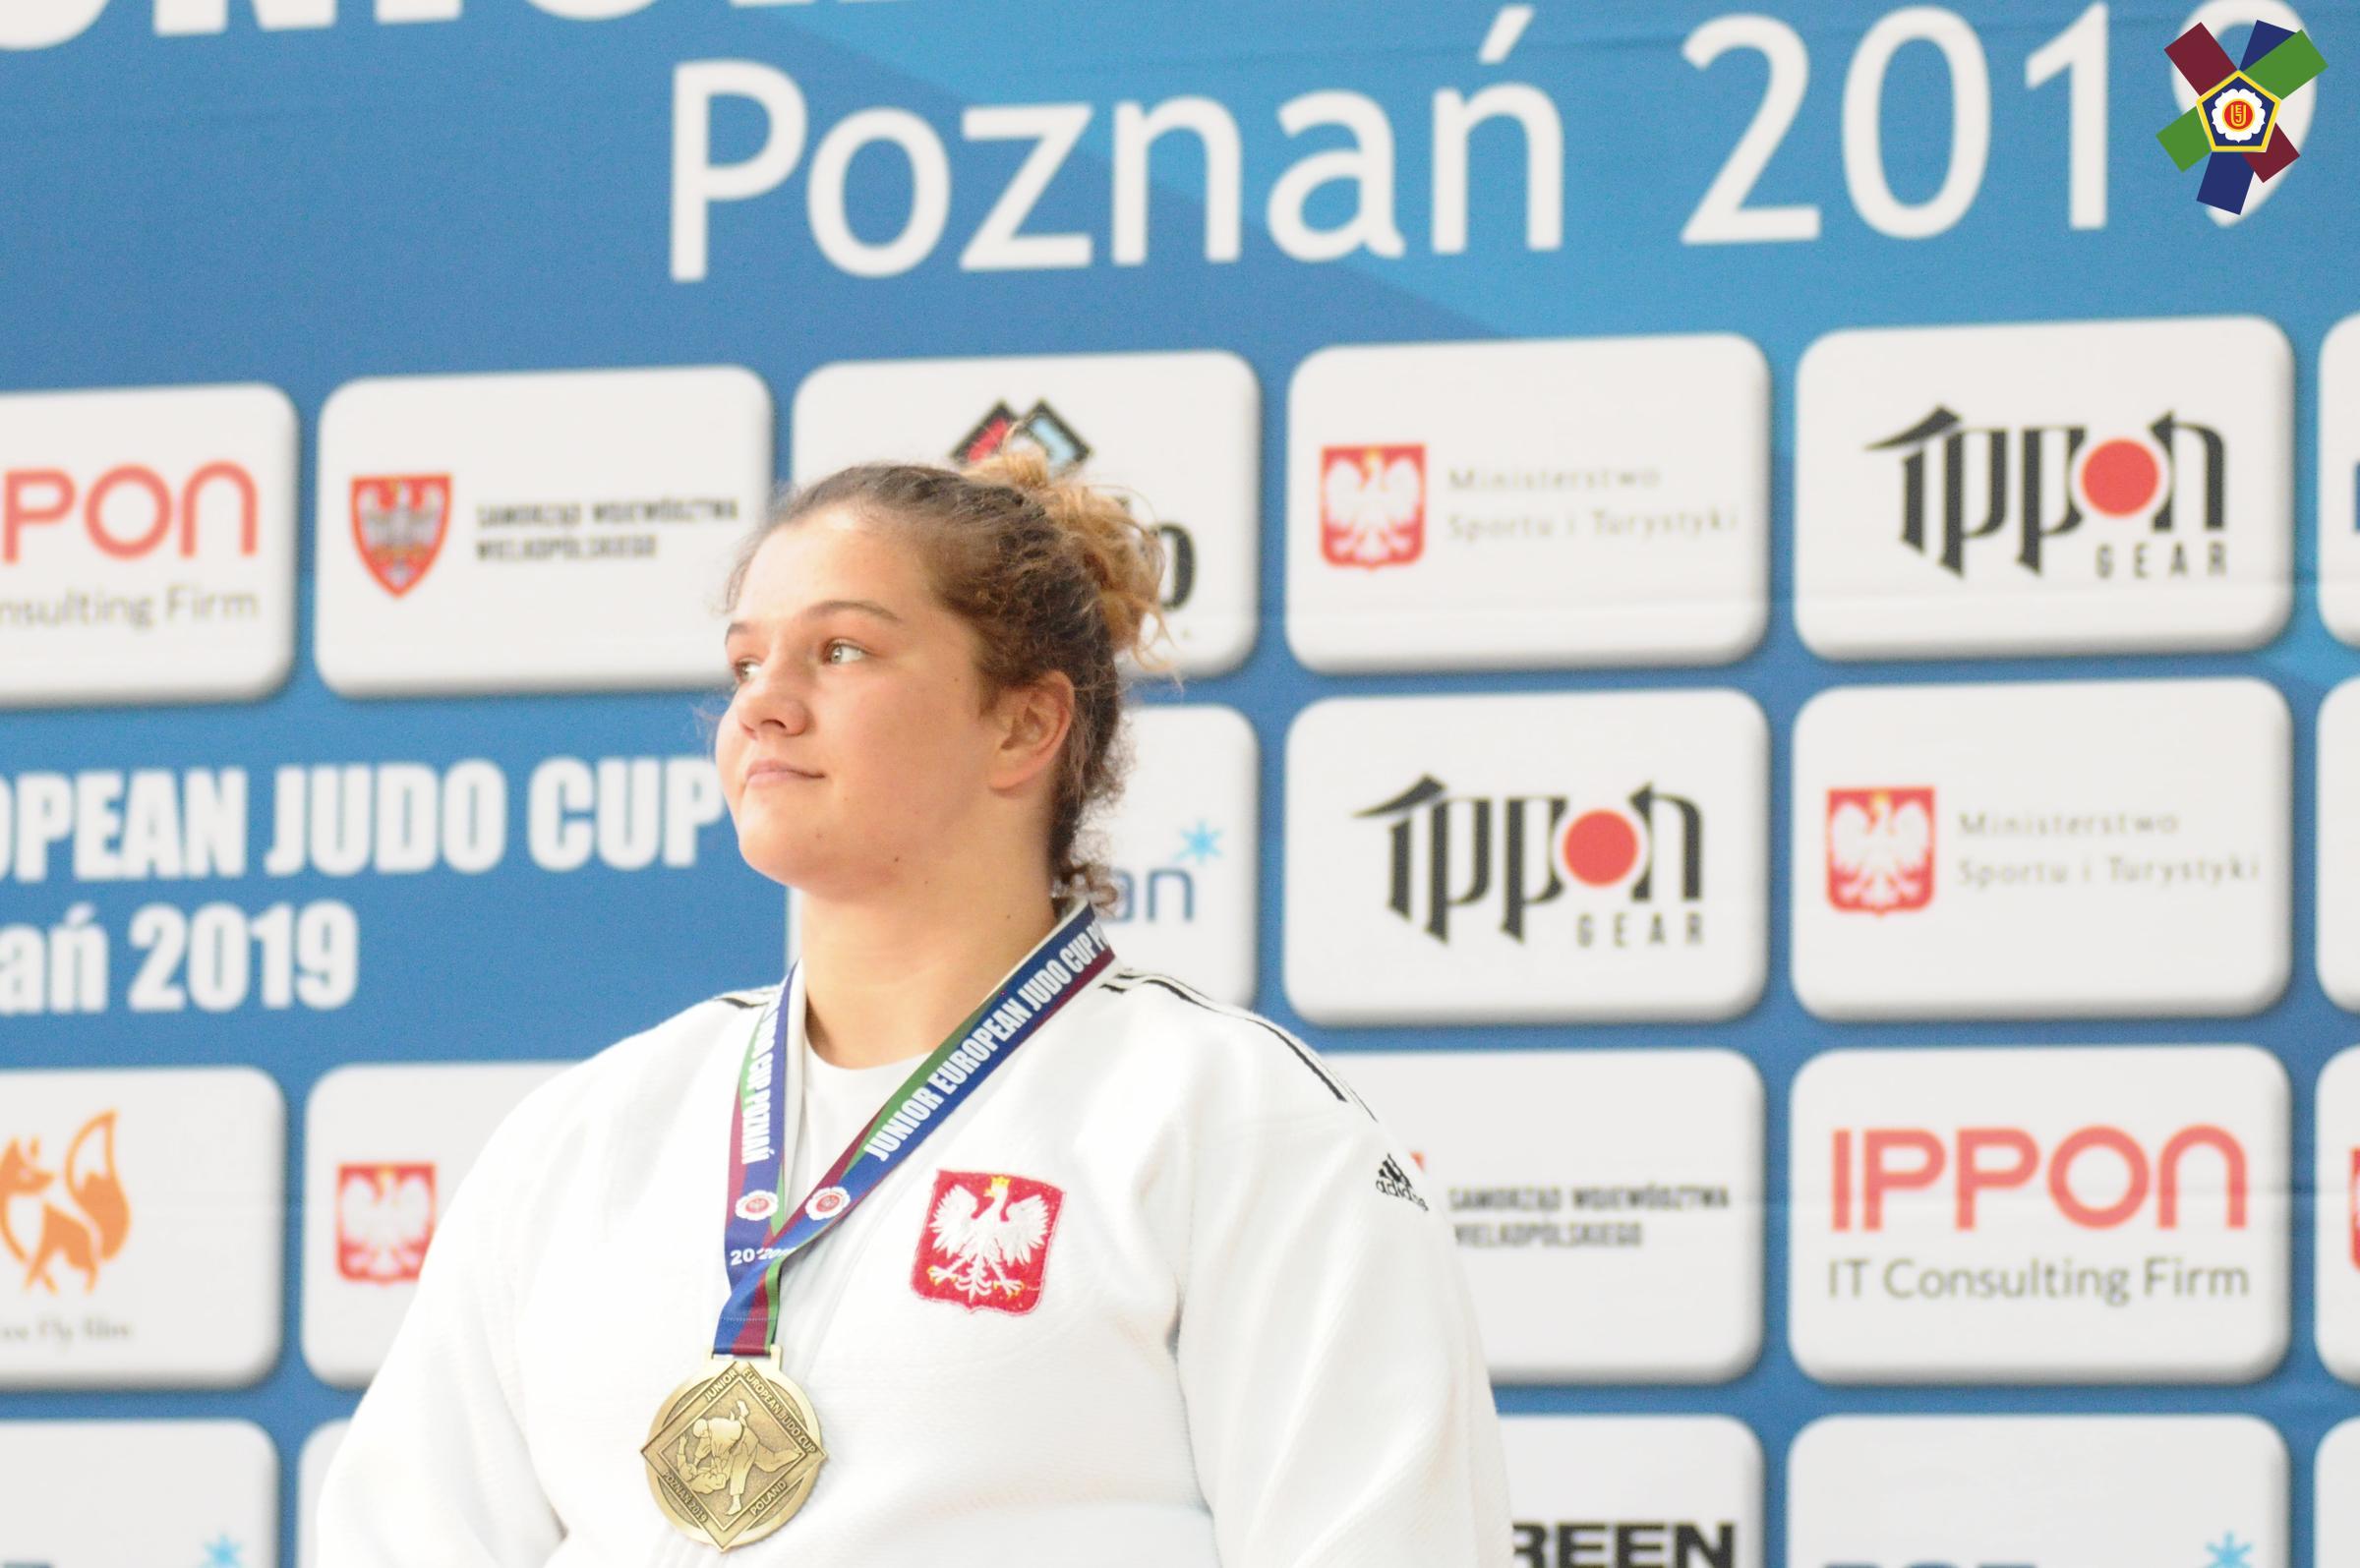 Kinga Wolszczak